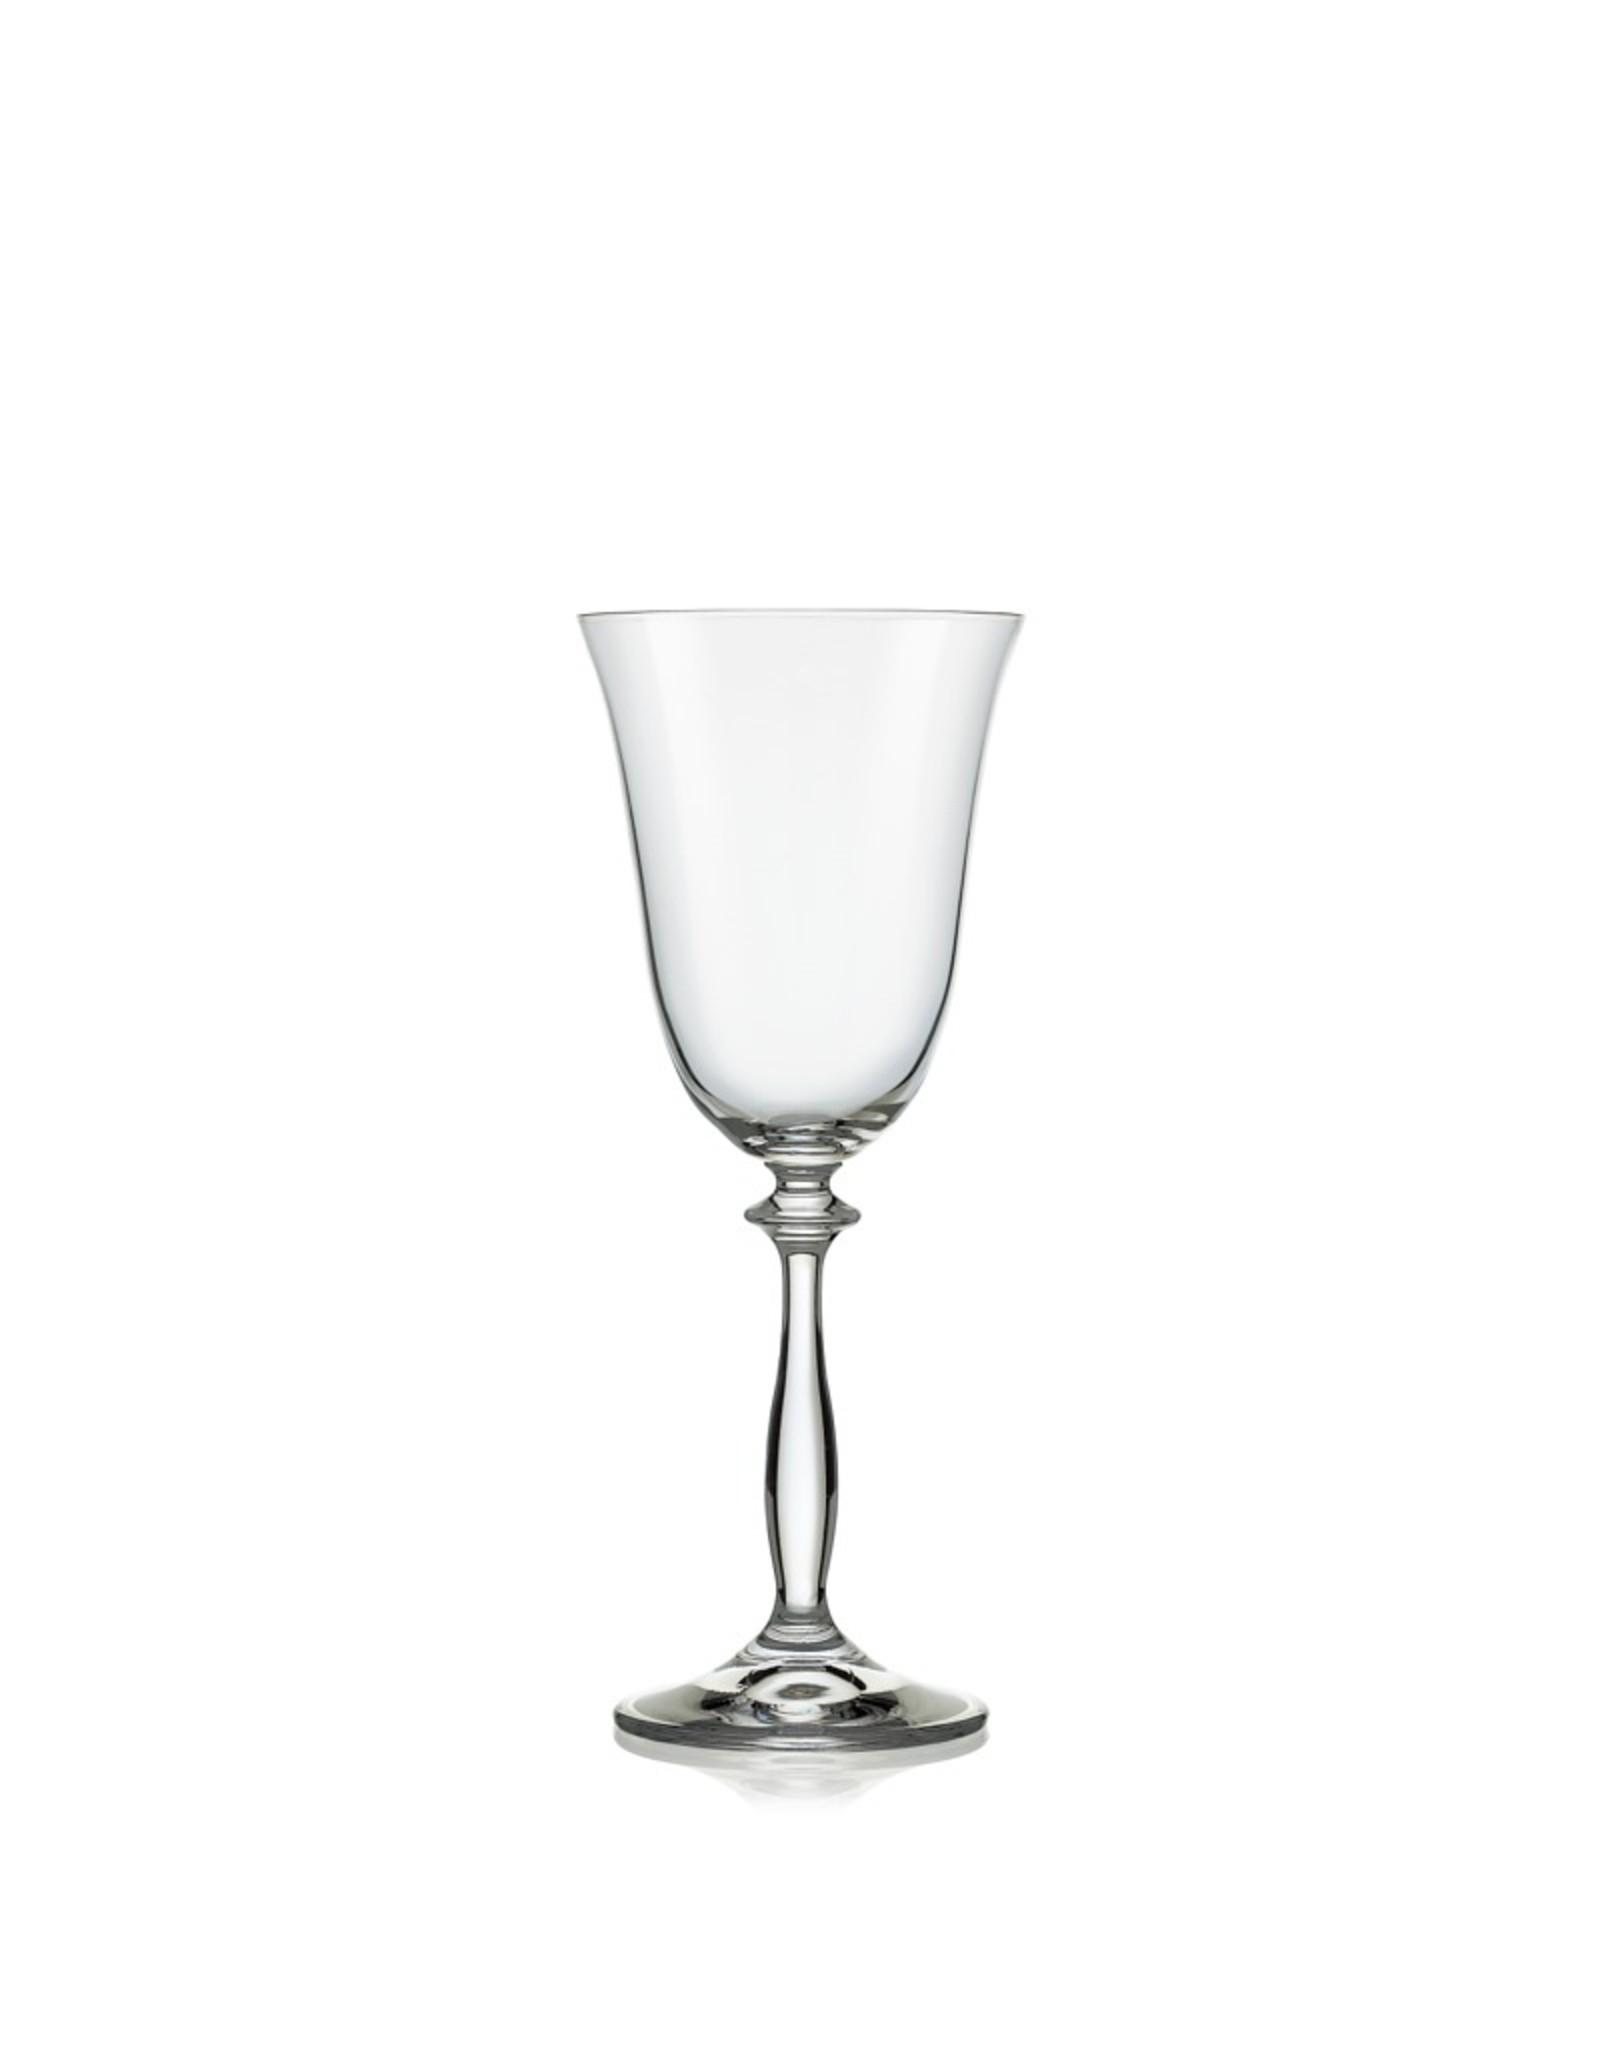 Crystalex Kristallen wijnglas Angela 185 ml /6st